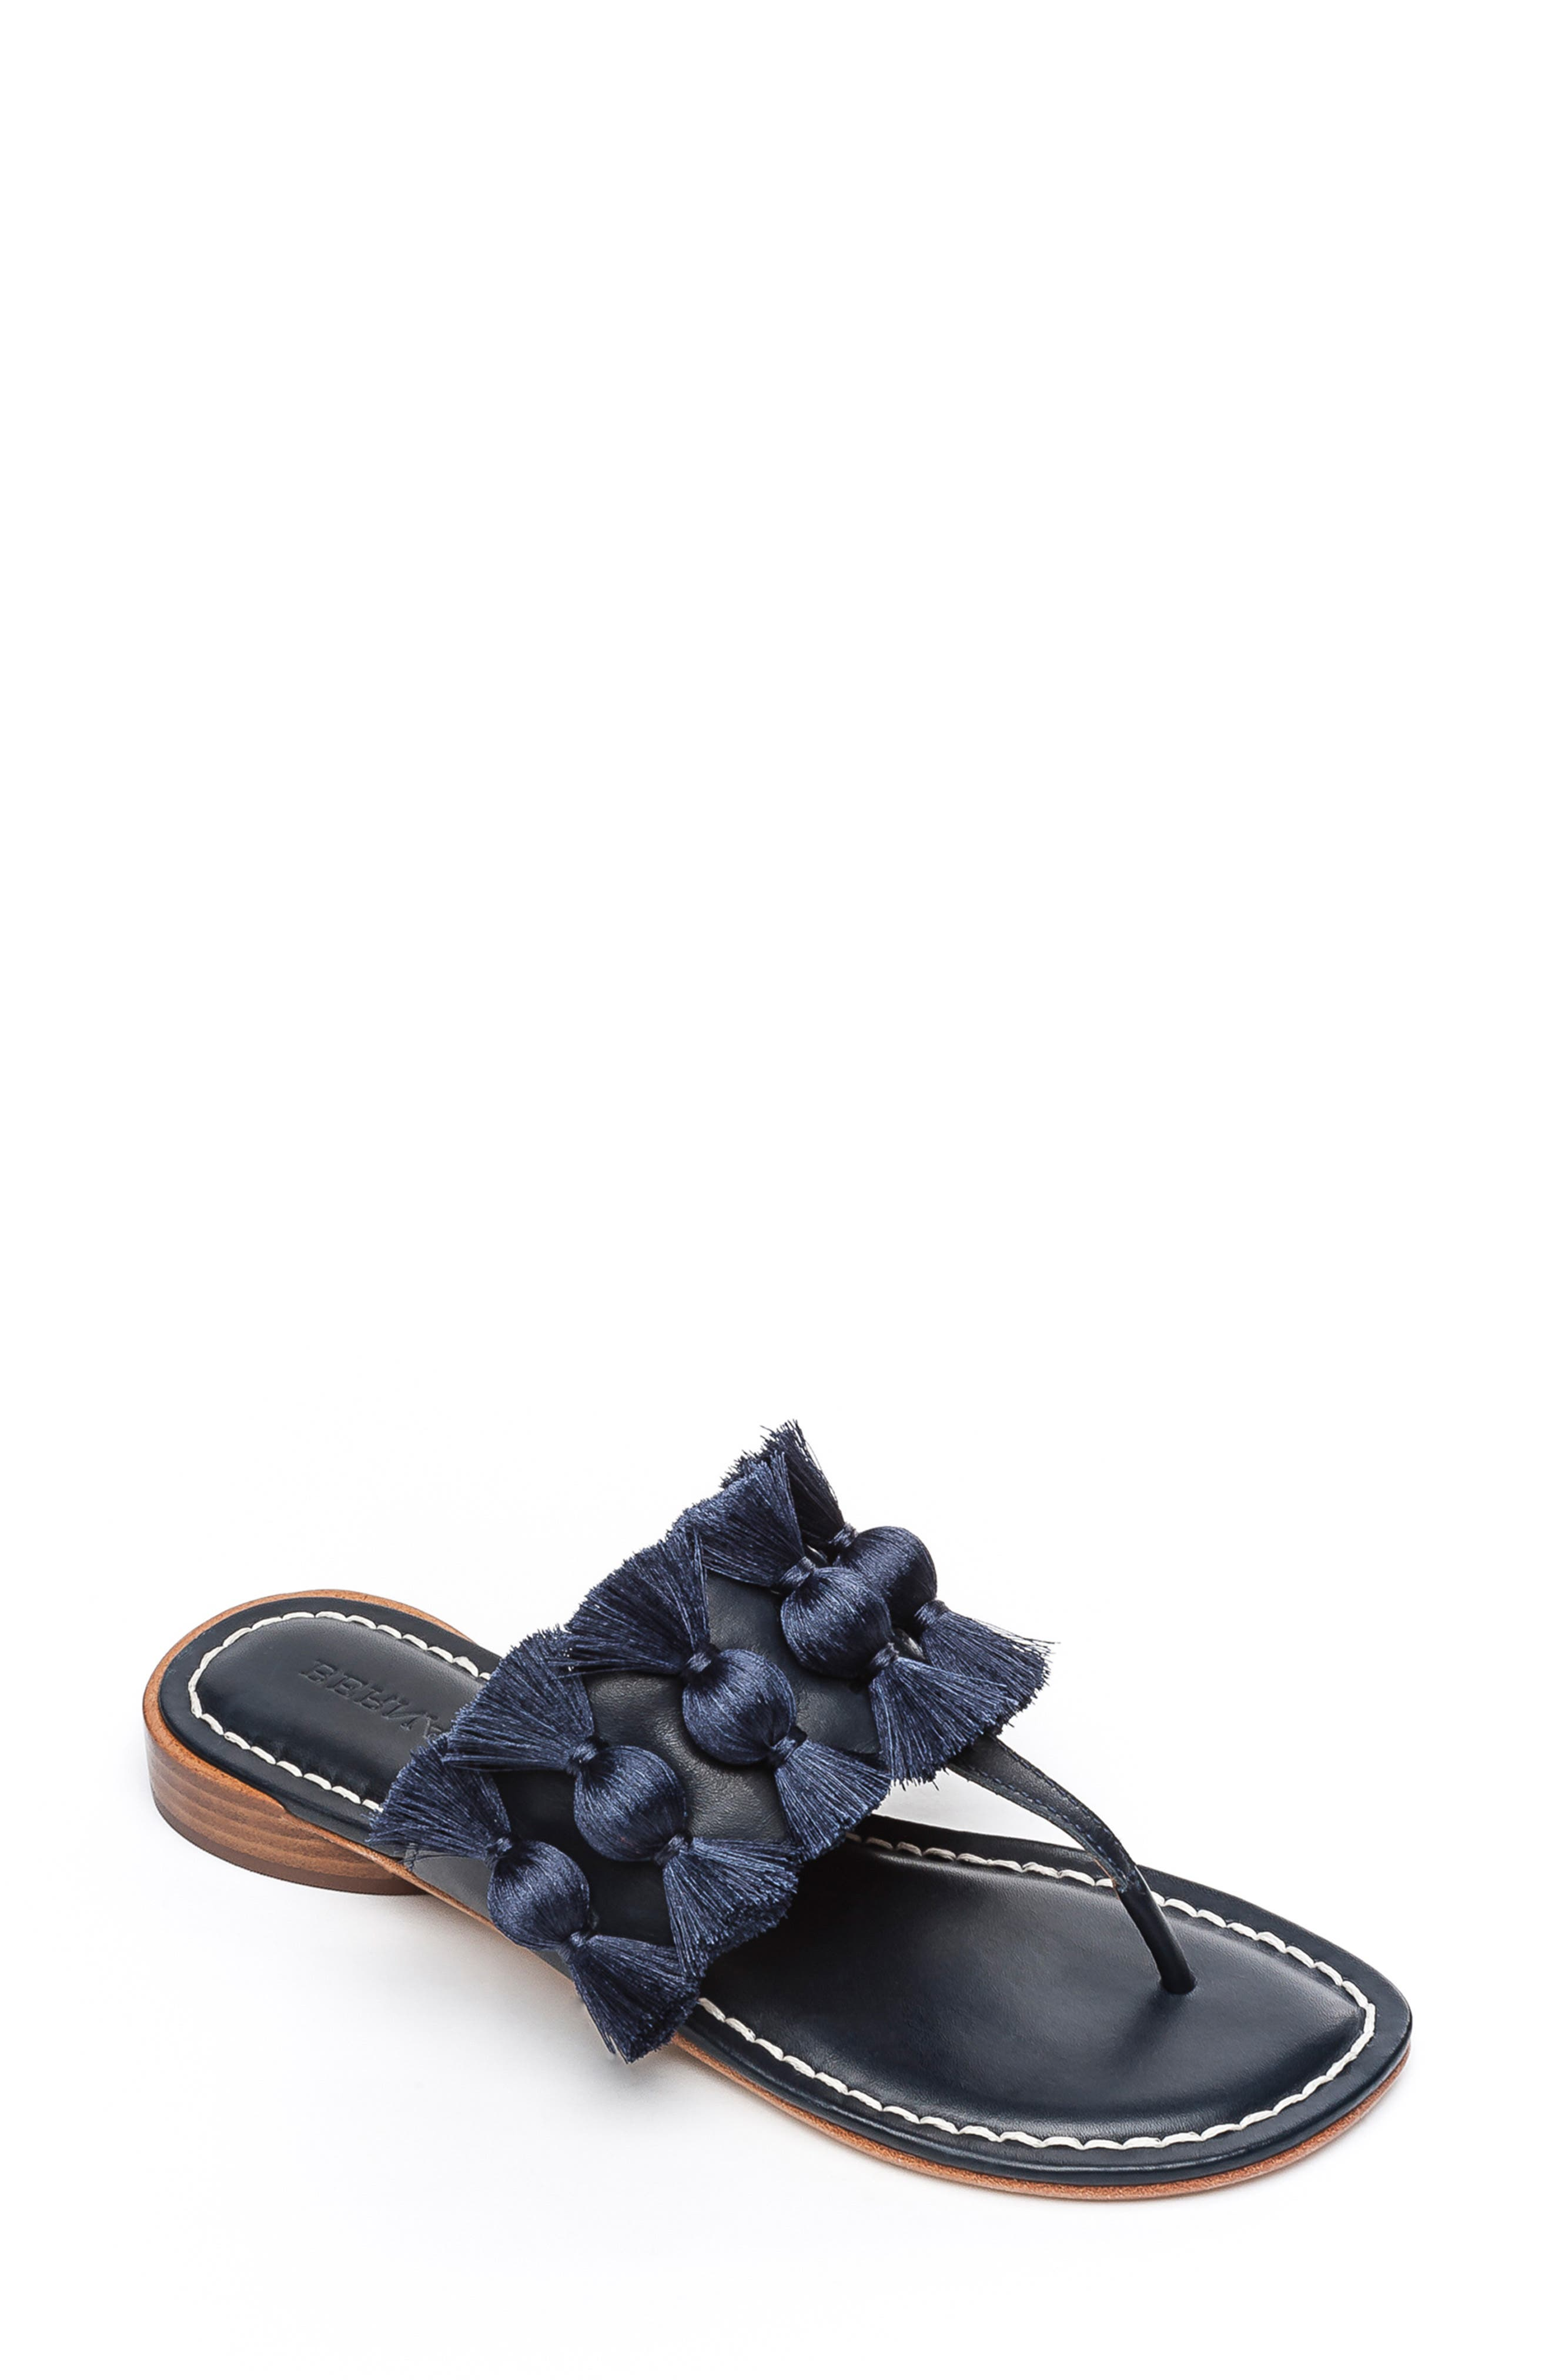 BERNARDO Footwear Tara Flip Flop, Main, color, NAVY ANTIQUE LEATHER